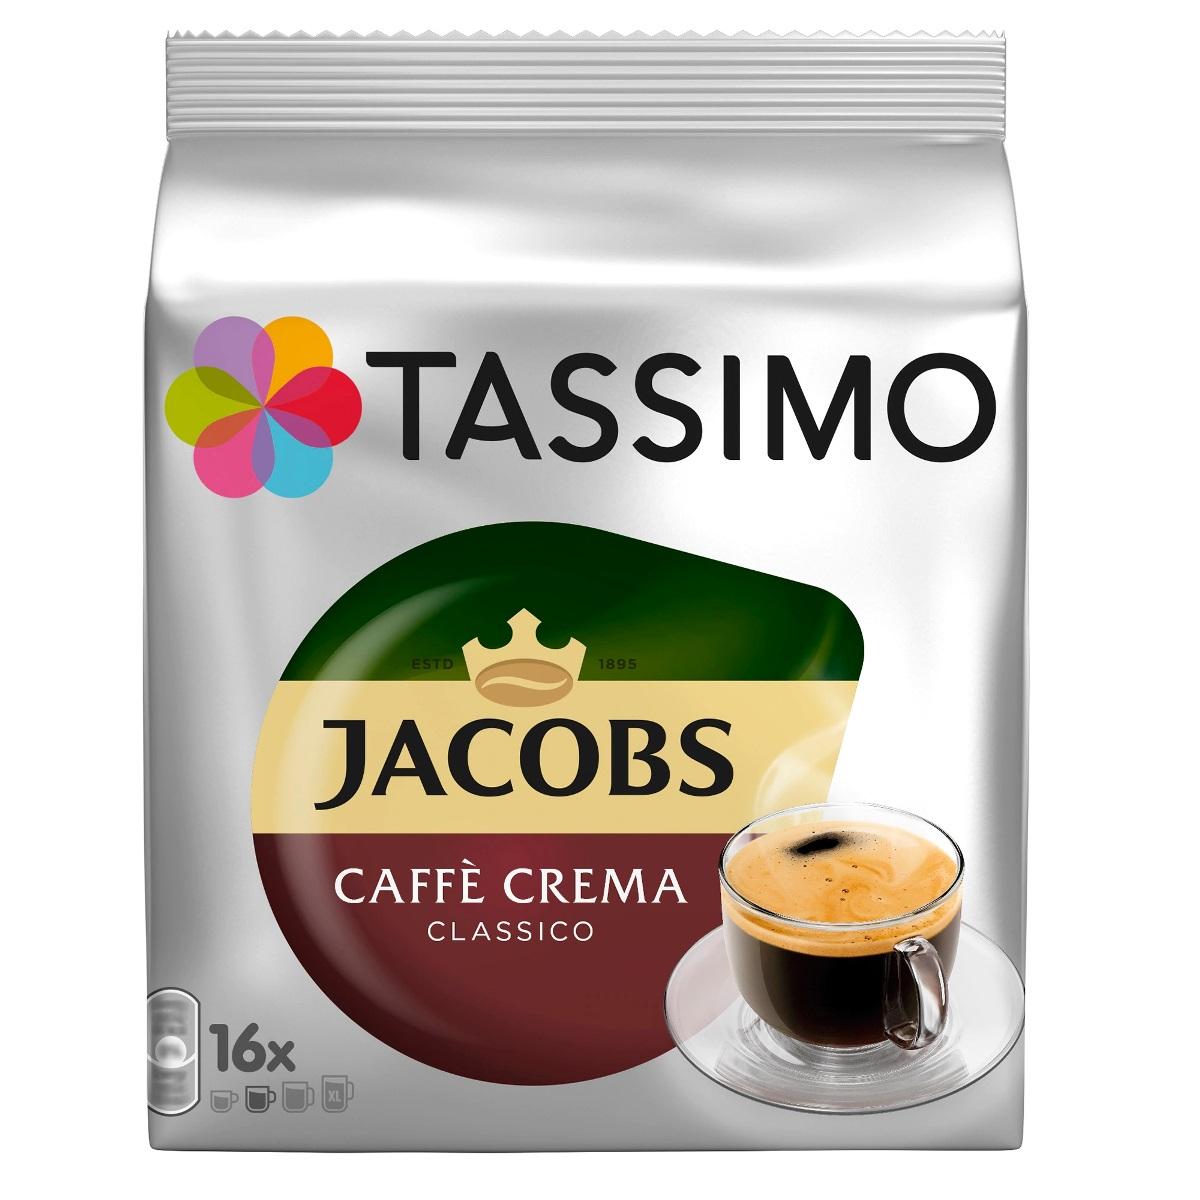 Capsule Tassimo Caffe Crema classico 16 buc